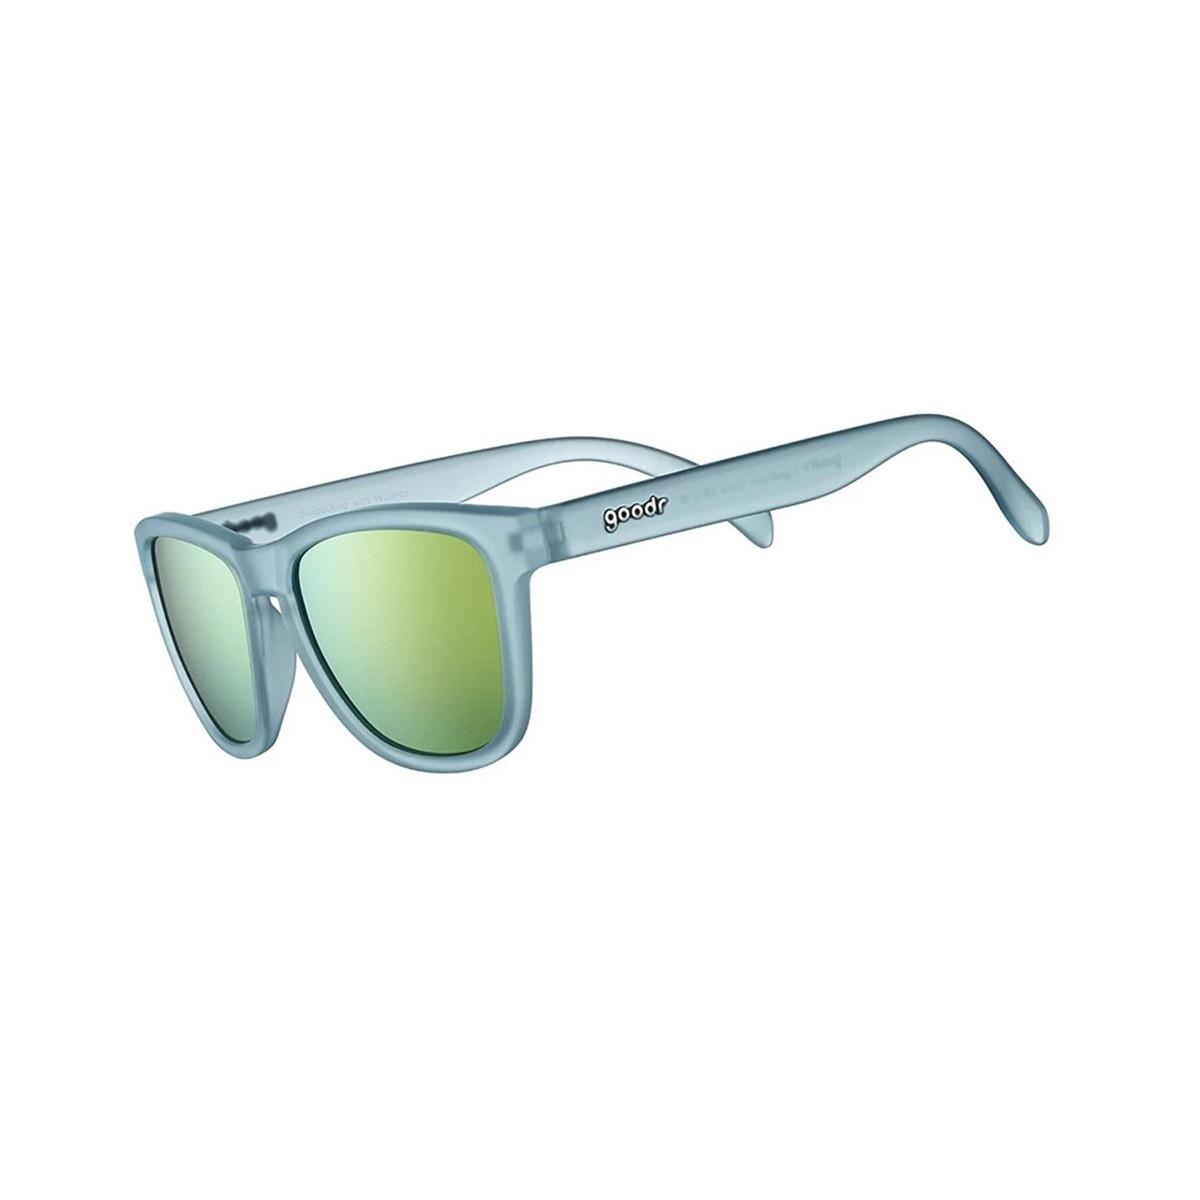 Oculos de Sol Goodr -  Sunbathing with Wizards